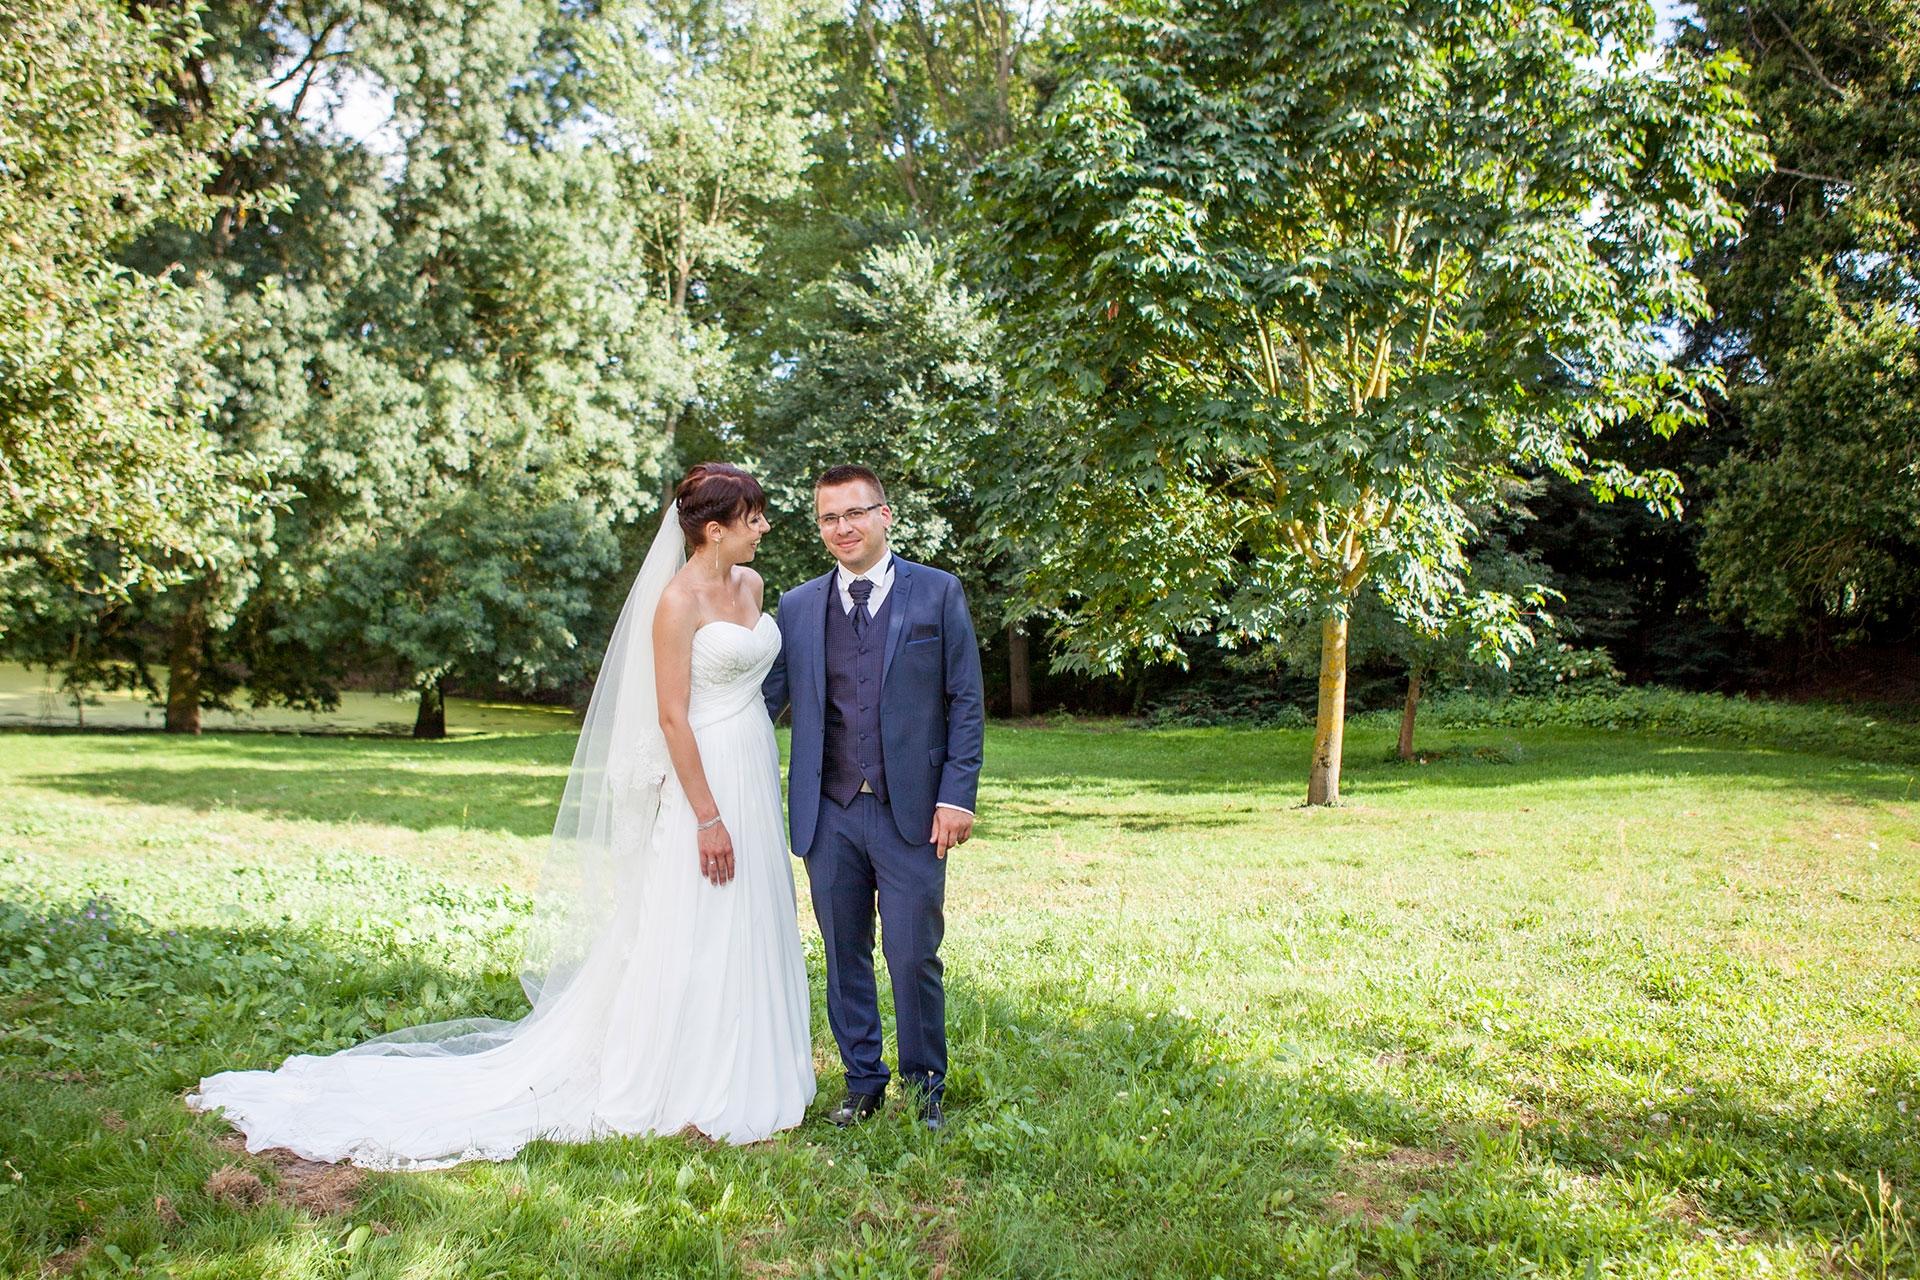 particuliers-evenements-mariages-oui-aurelie&geoffrey-27